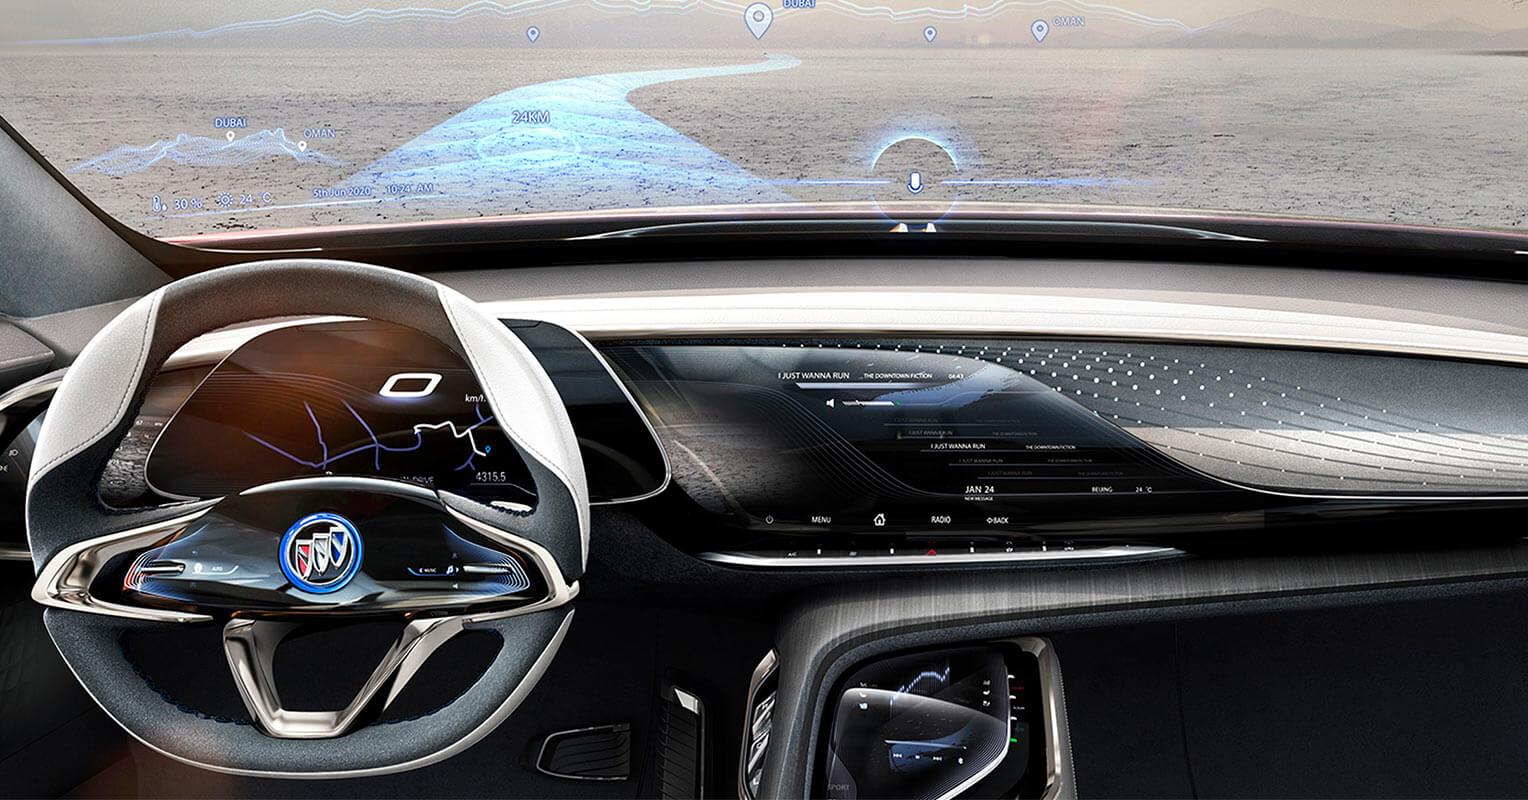 Buick Enspire concept interior